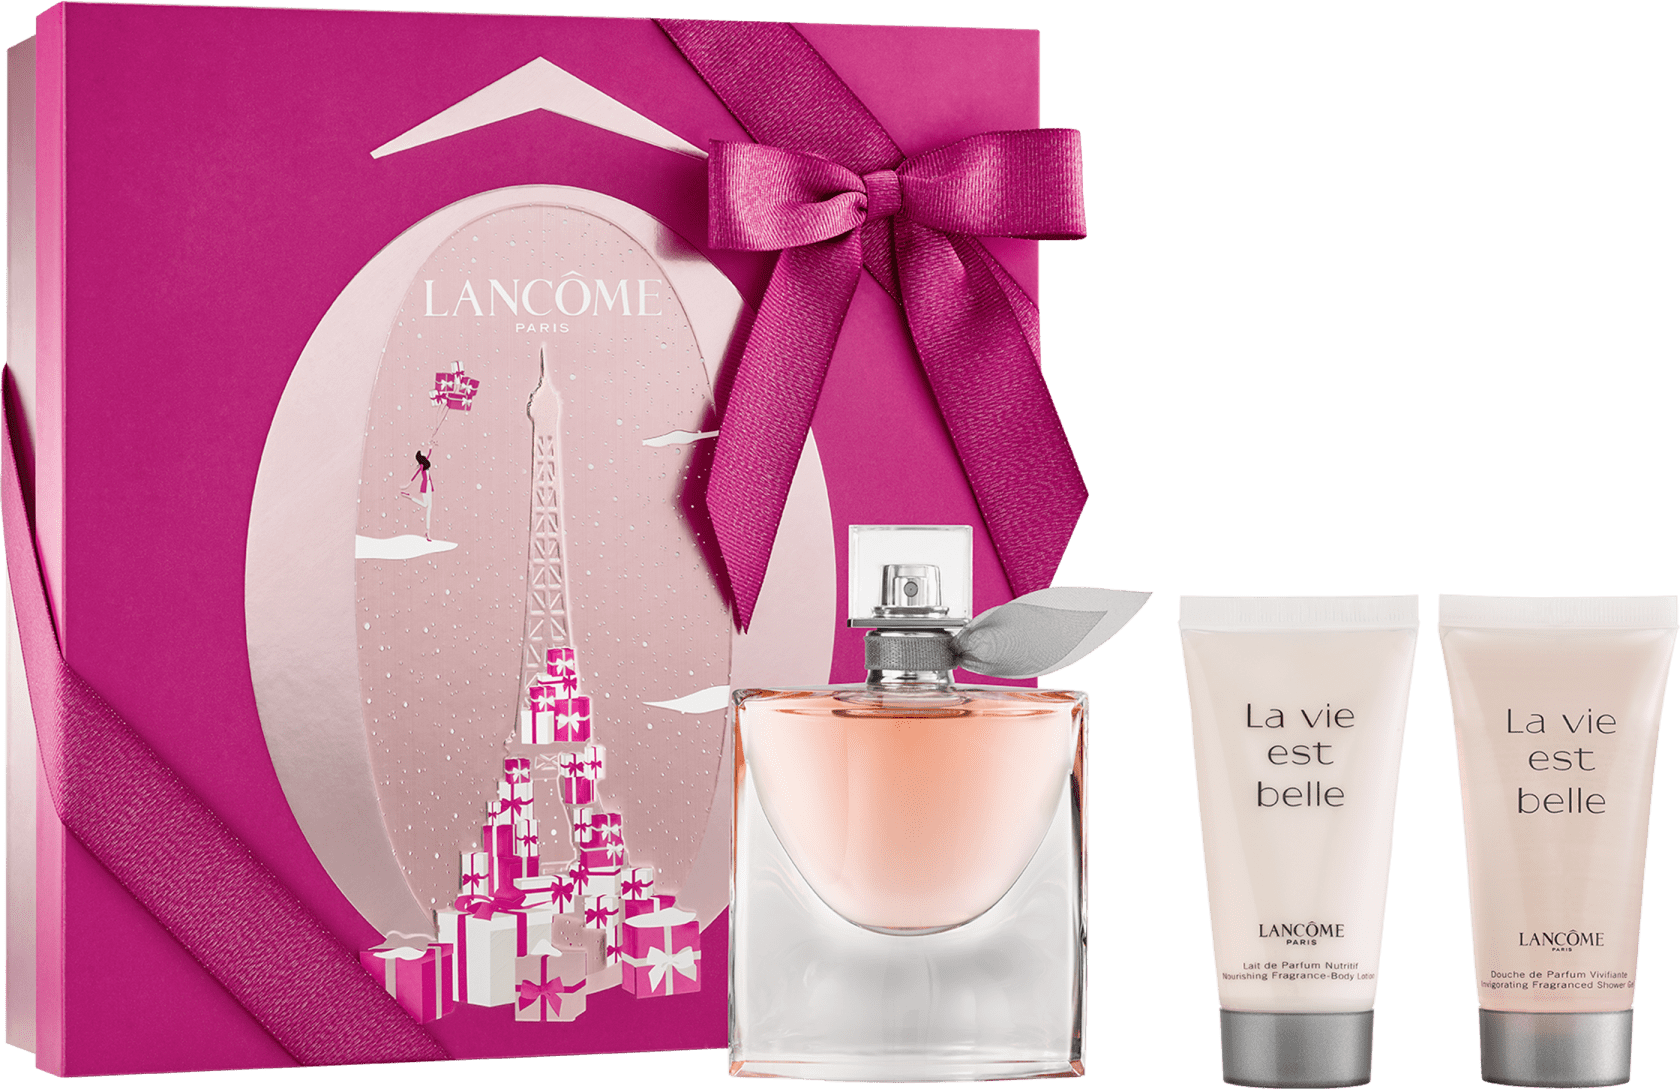 e23b26901f Conjunto La Vie Est Belle Lancôme Feminino - Eau de Parfum 50ml + Shower  Gel 50ml